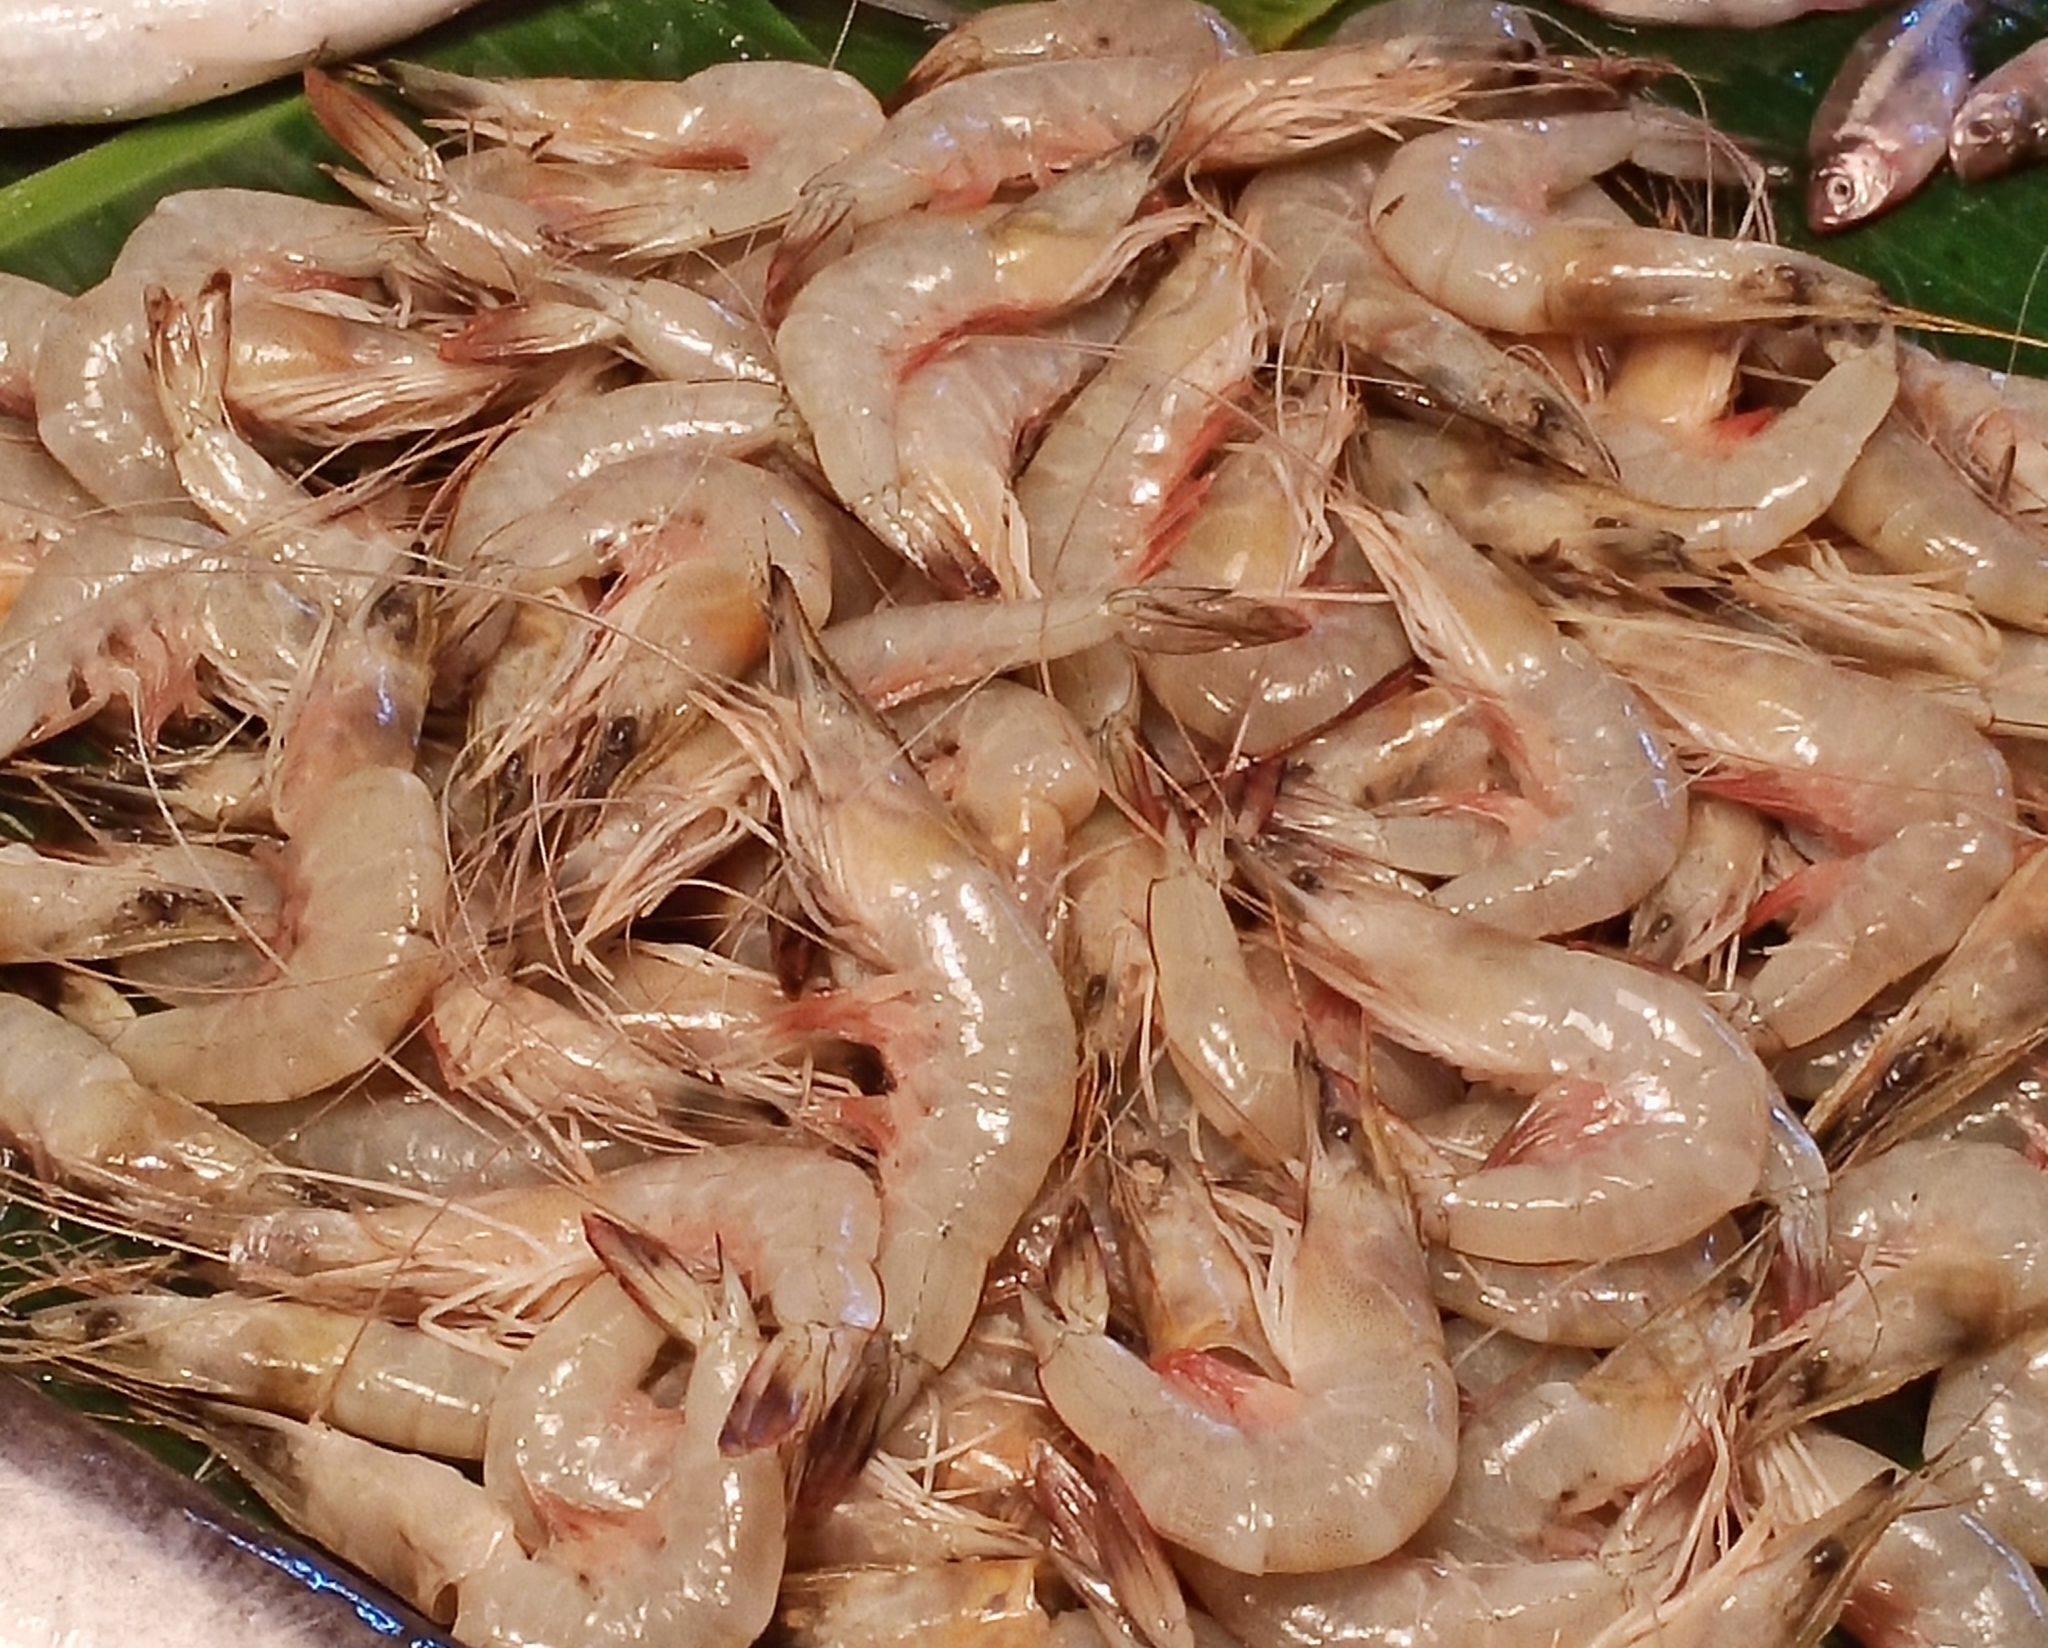 Chingri Chali Deshi River Fish